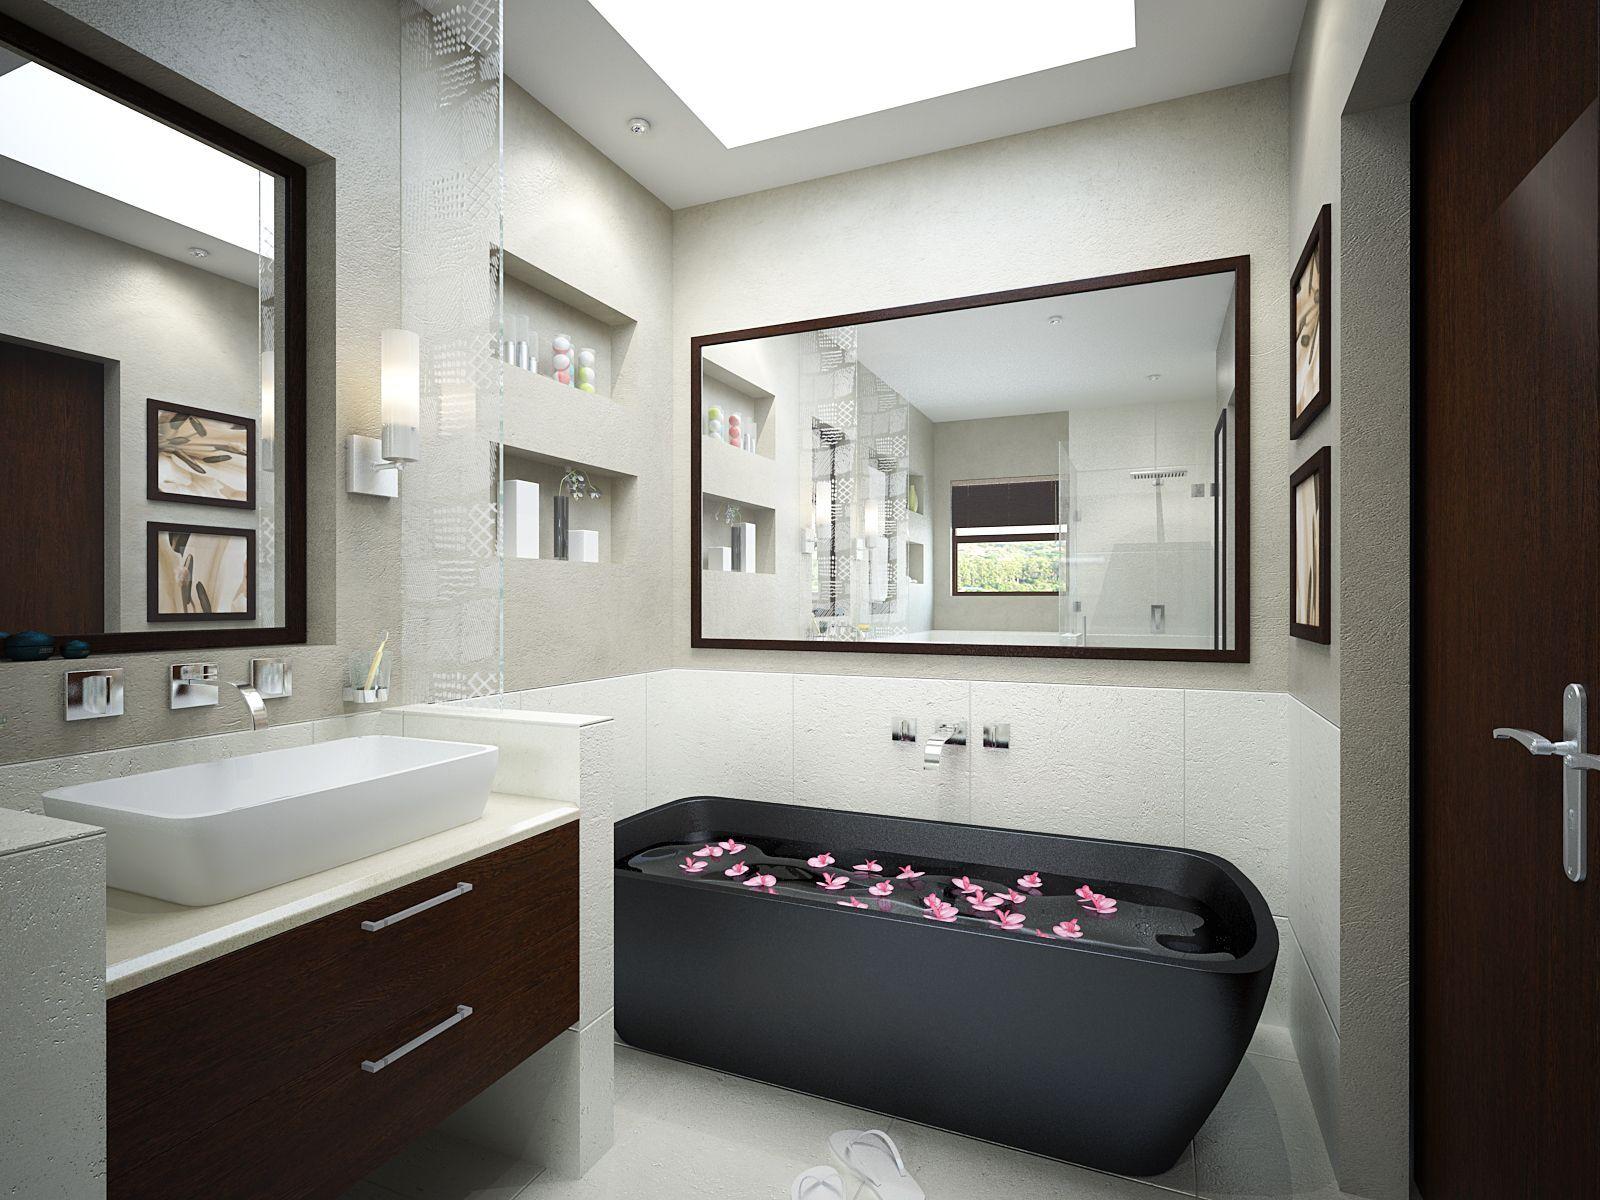 Sample Bathroom Designs Modern Small Black Bathtub For Modern Small Bathroom Design  Some